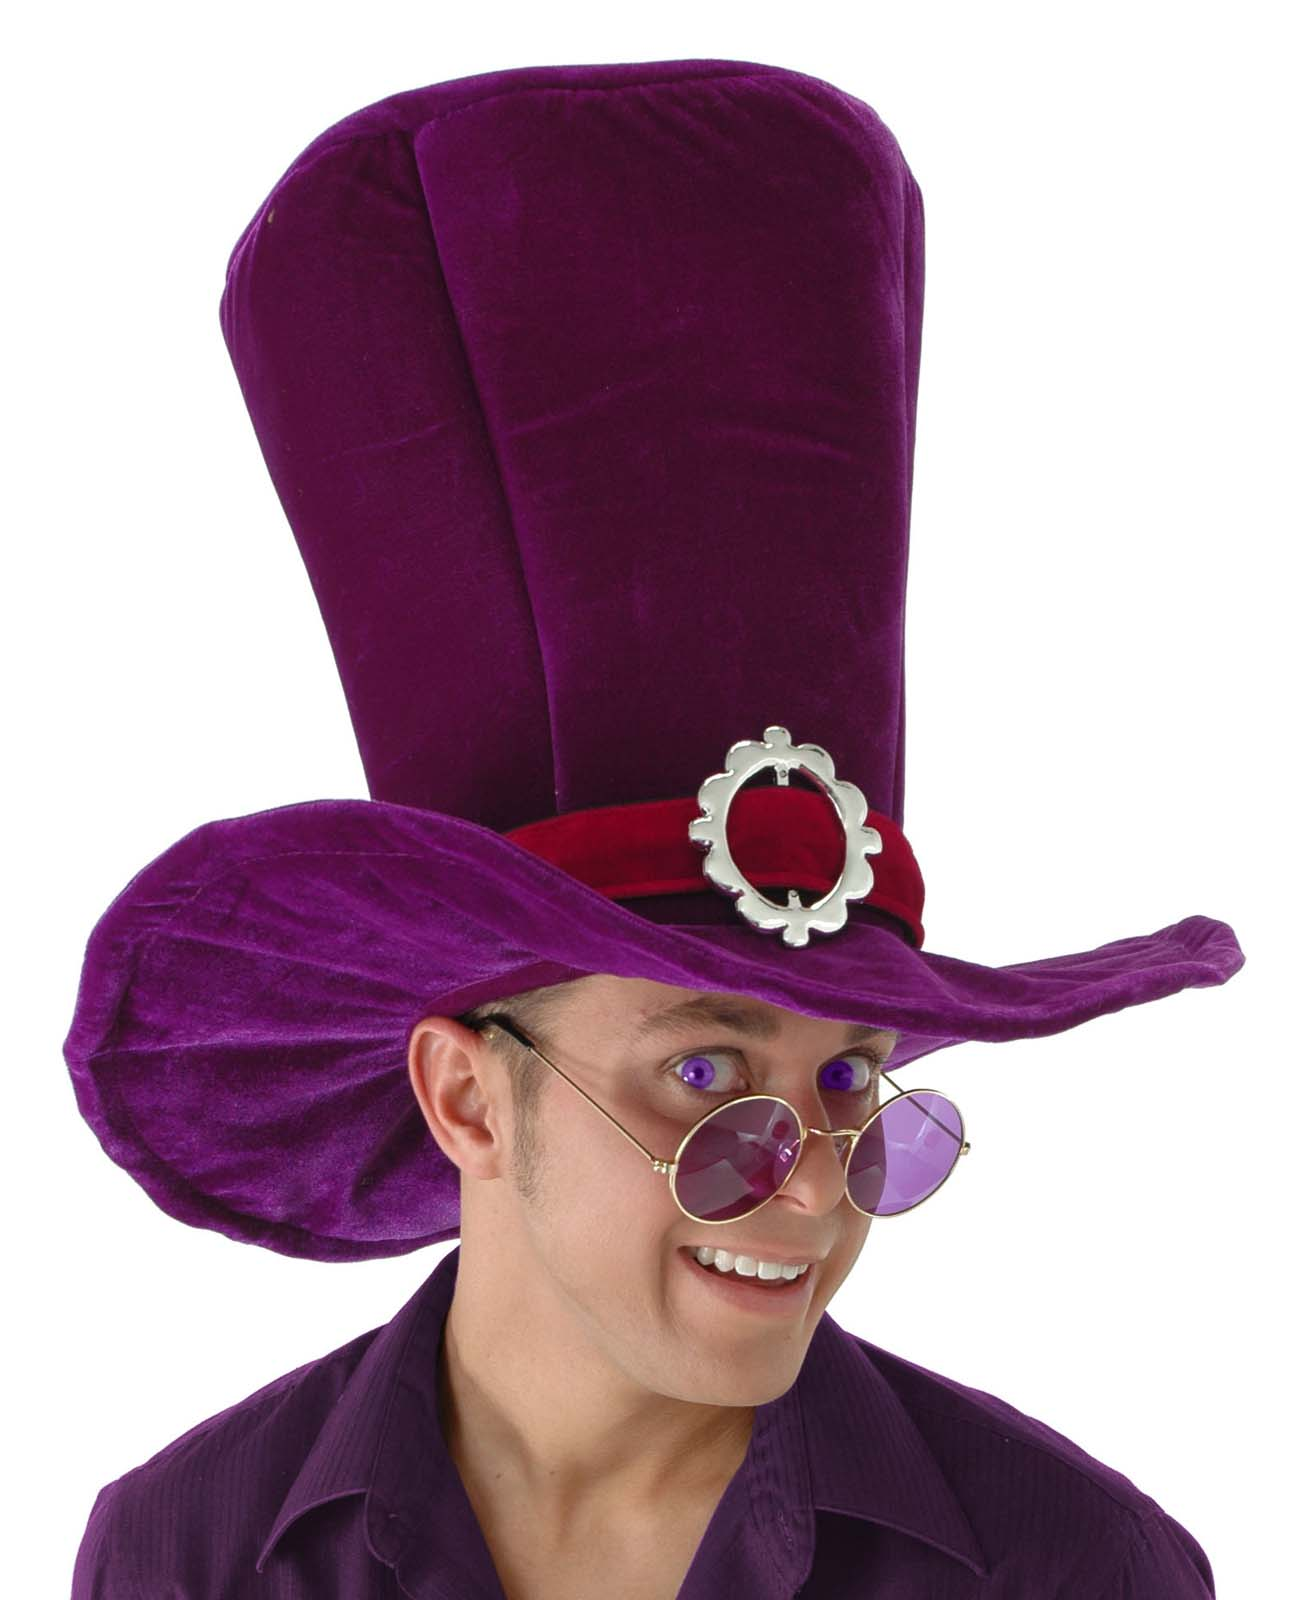 Alice In Wonderland Mad Hatter Madhatter Adult Giant Top